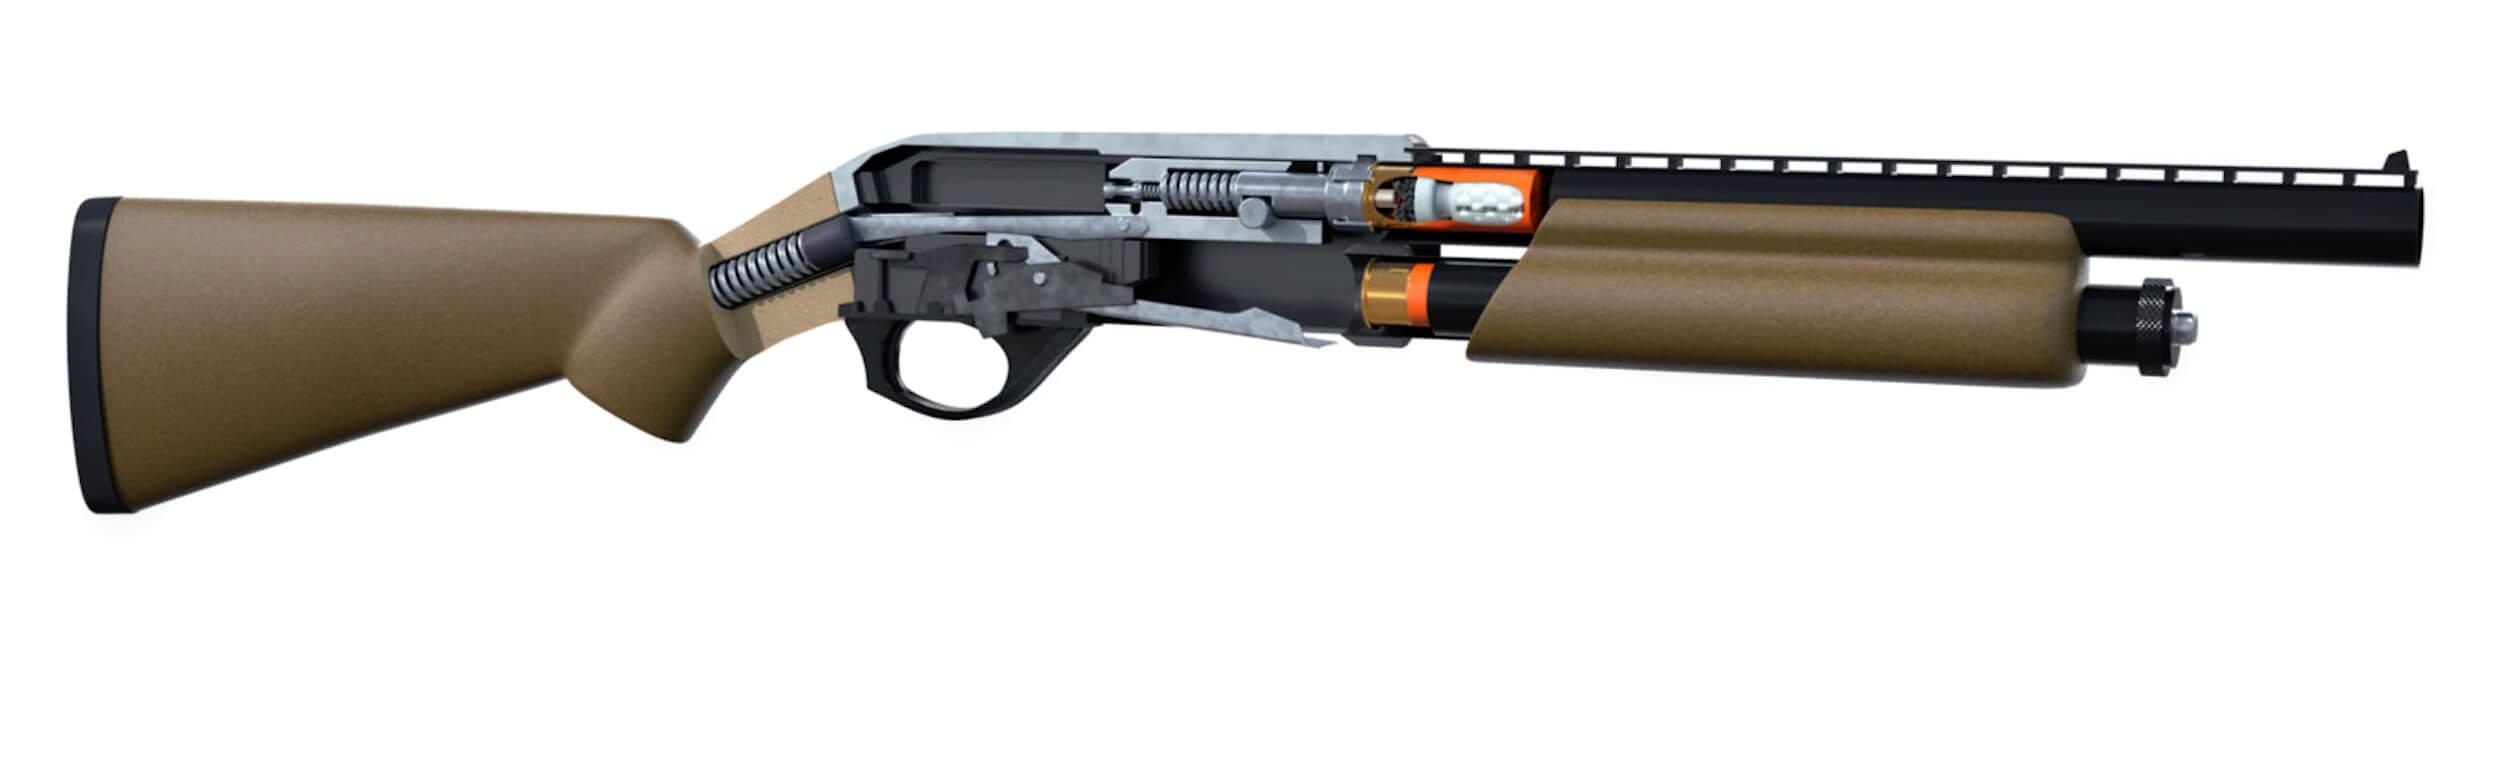 Shotgun Main by Barry Croucher